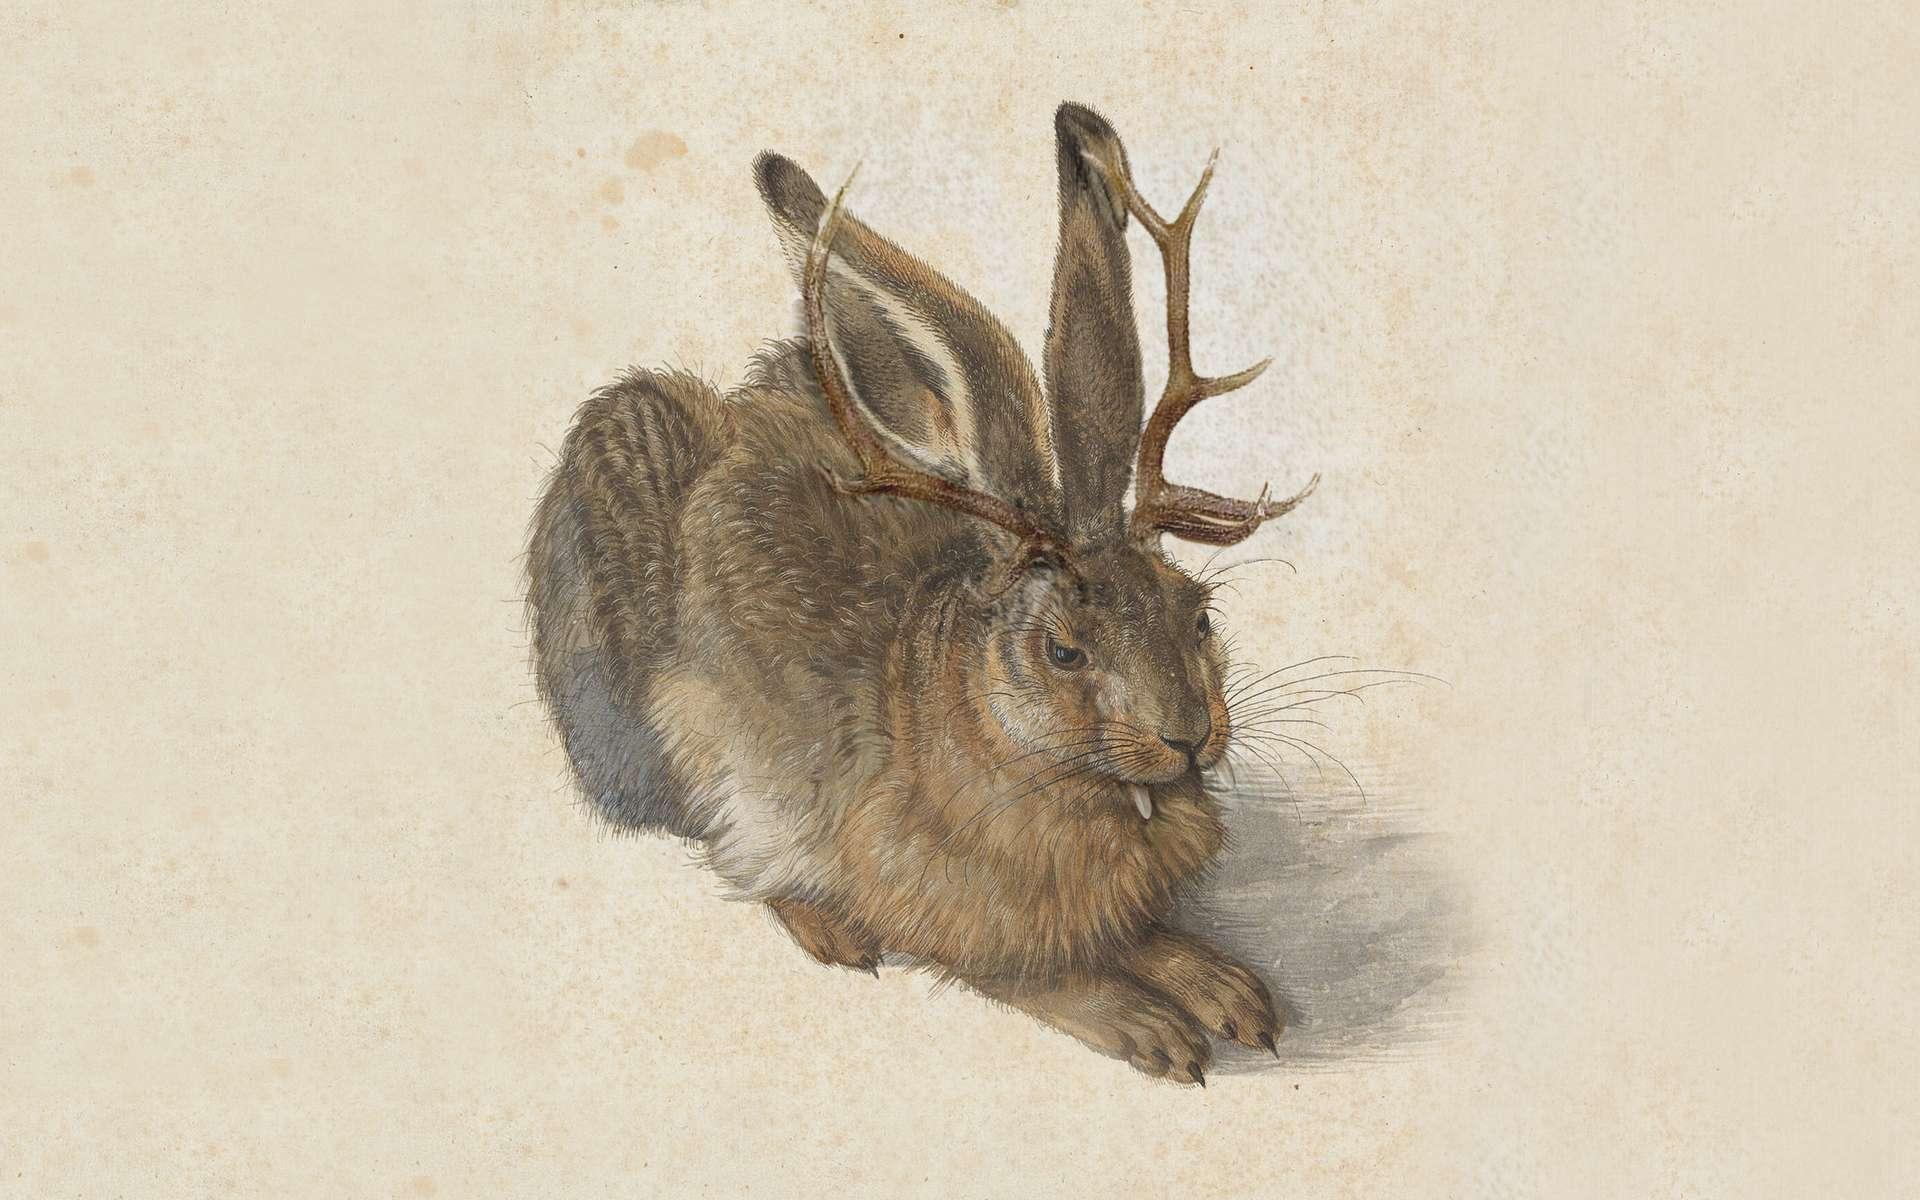 Le jackalope existe-t-il ? © Thomas Grunfeld, Google Arts & Culture